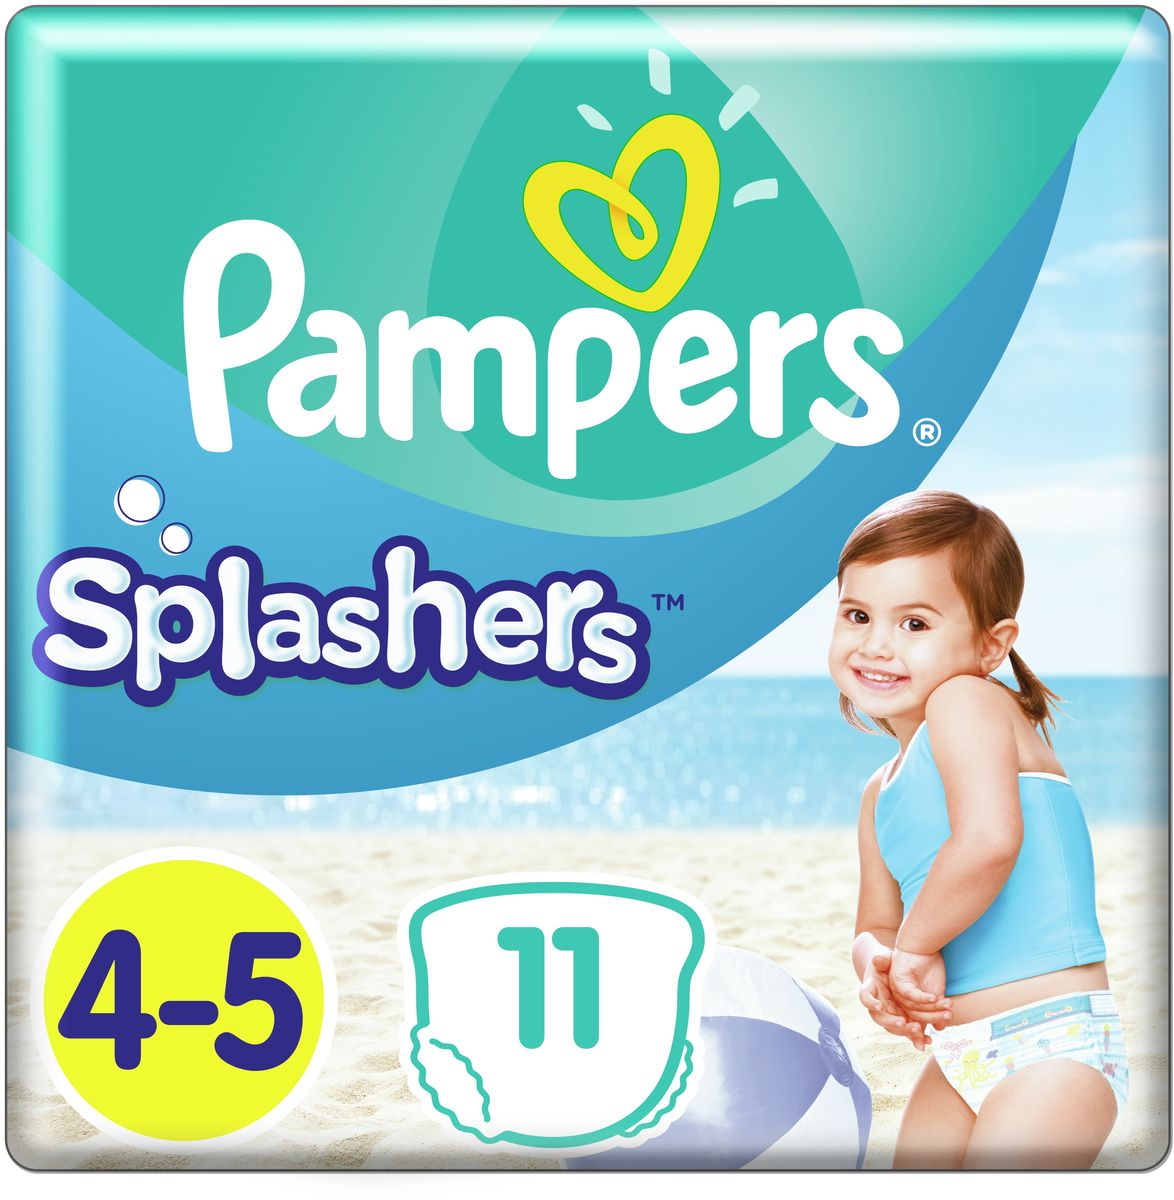 Pampers Трусики для плавания Splashers 9-15 кг (размер 4-5) 11 шт трусики подгузники pampers splashers для плавания maxi junior 9 15 кг 11 шт